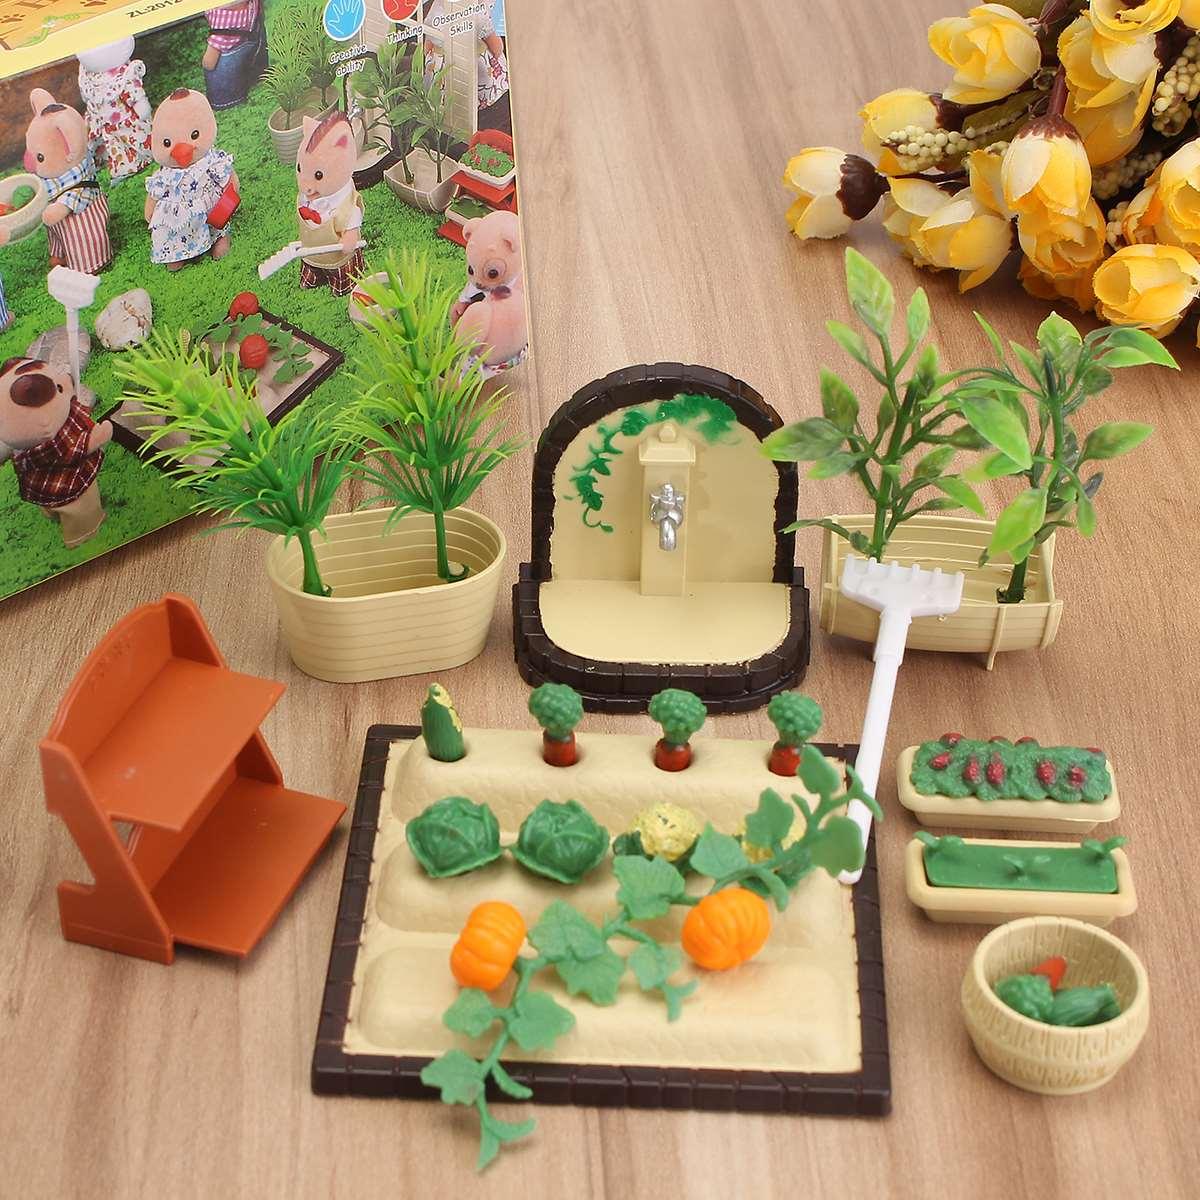 Miniature ornaments - Garden Ornaments Families Toy Miniature Furniture Vegetable Garden Set Kids Pretend Toys Girls Gifts Furniture For